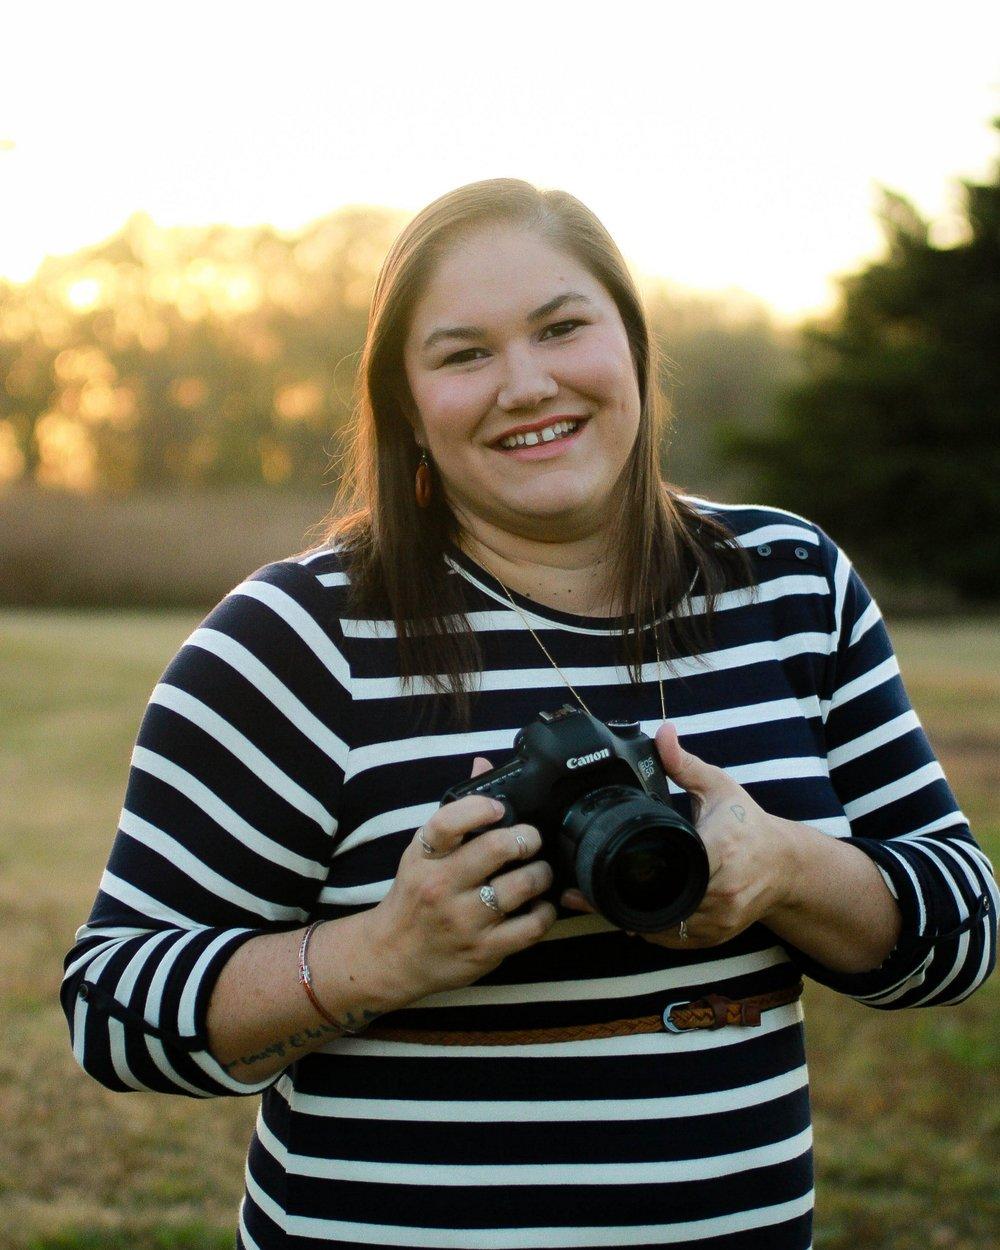 Katie Lewis - KatiewLew Photography